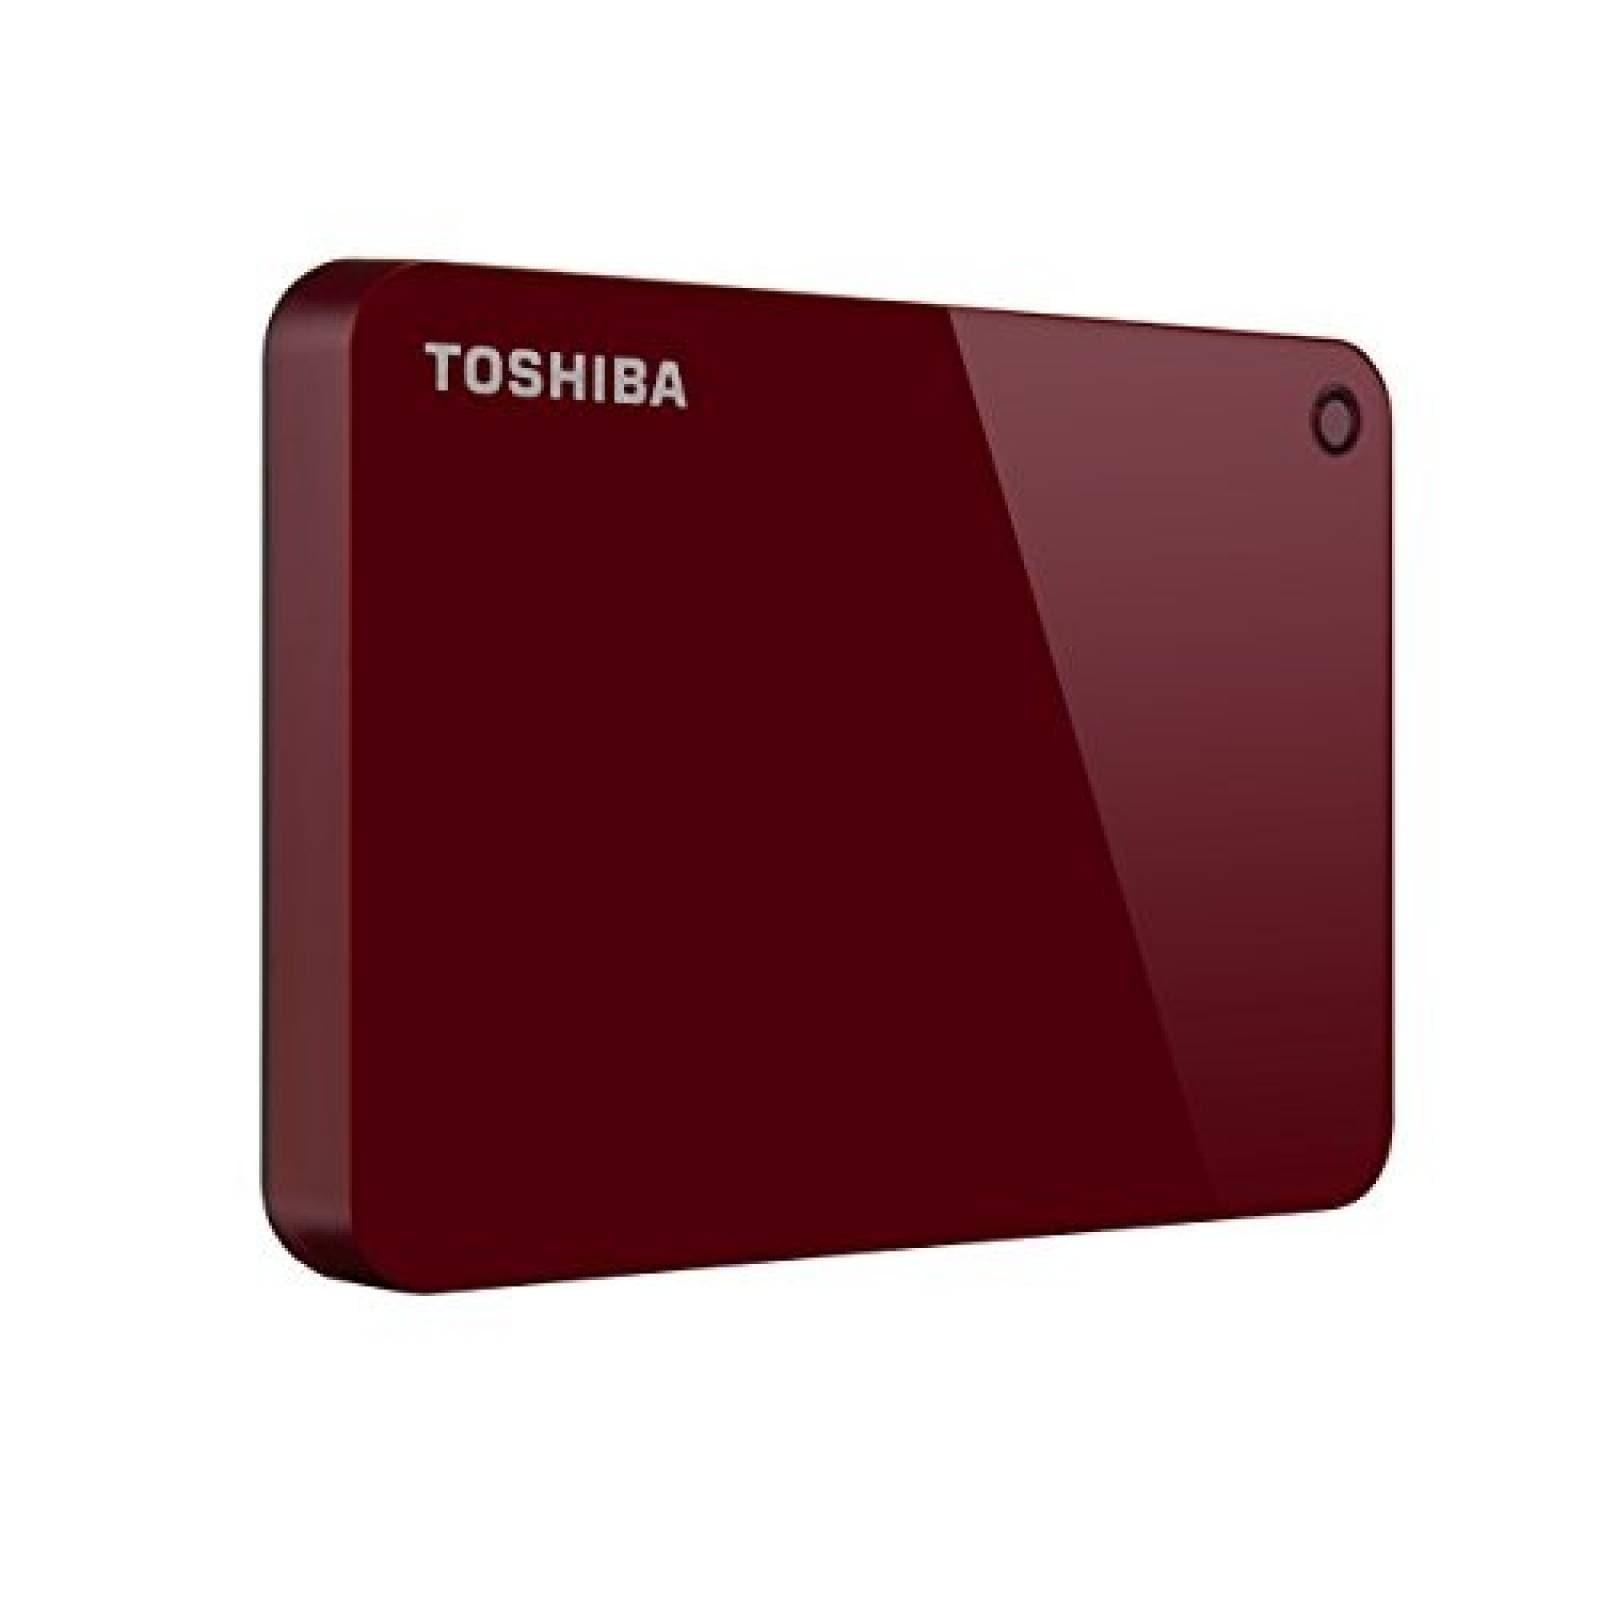 Disco duro externo Toshiba Canvio Advance 1TB USB 3.0 -Rojo